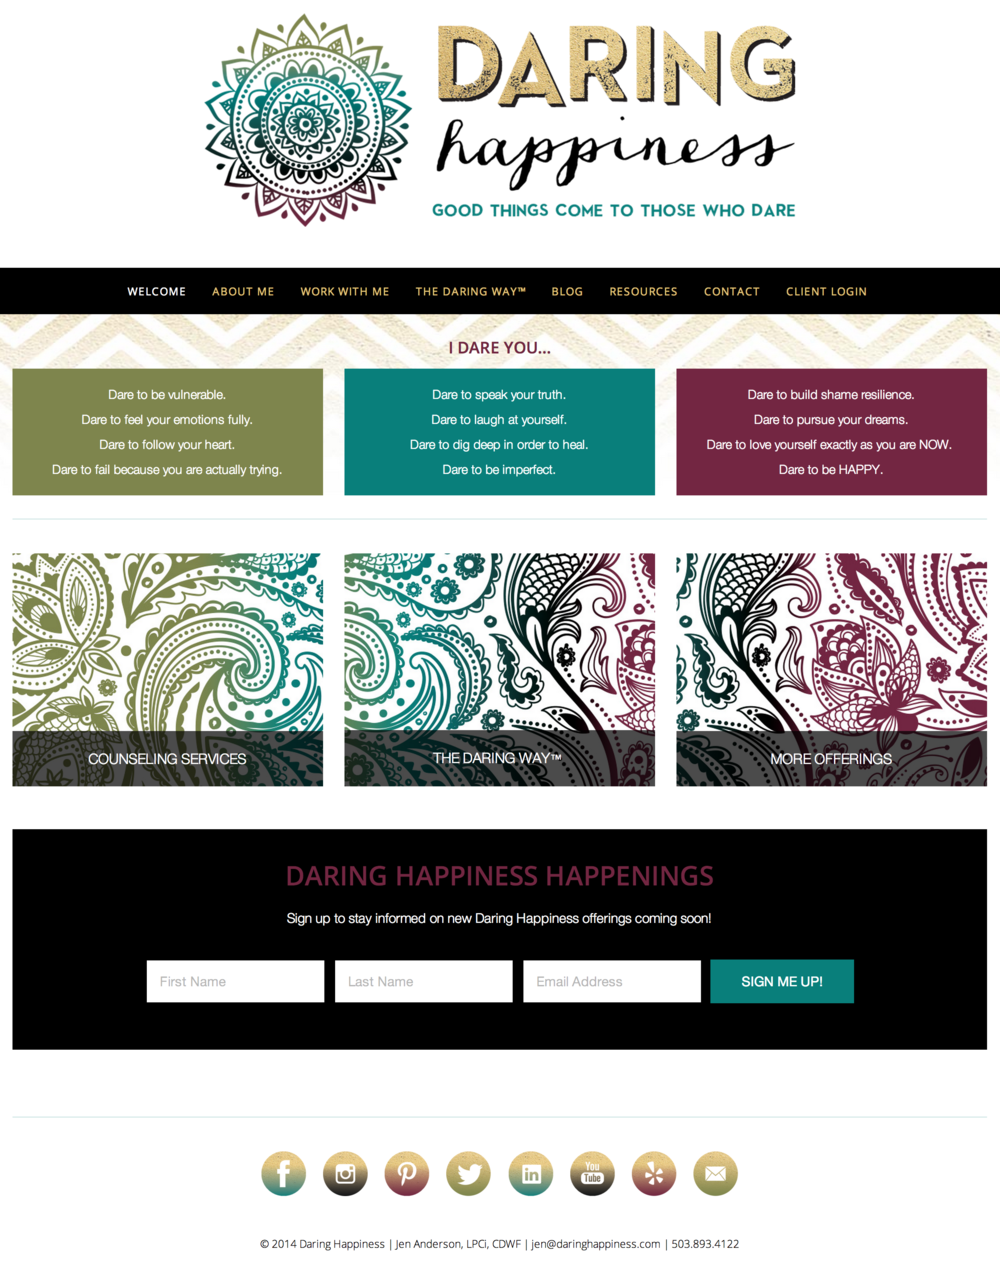 Website Setup Service: Squarespace Template Setup and Theme Customization